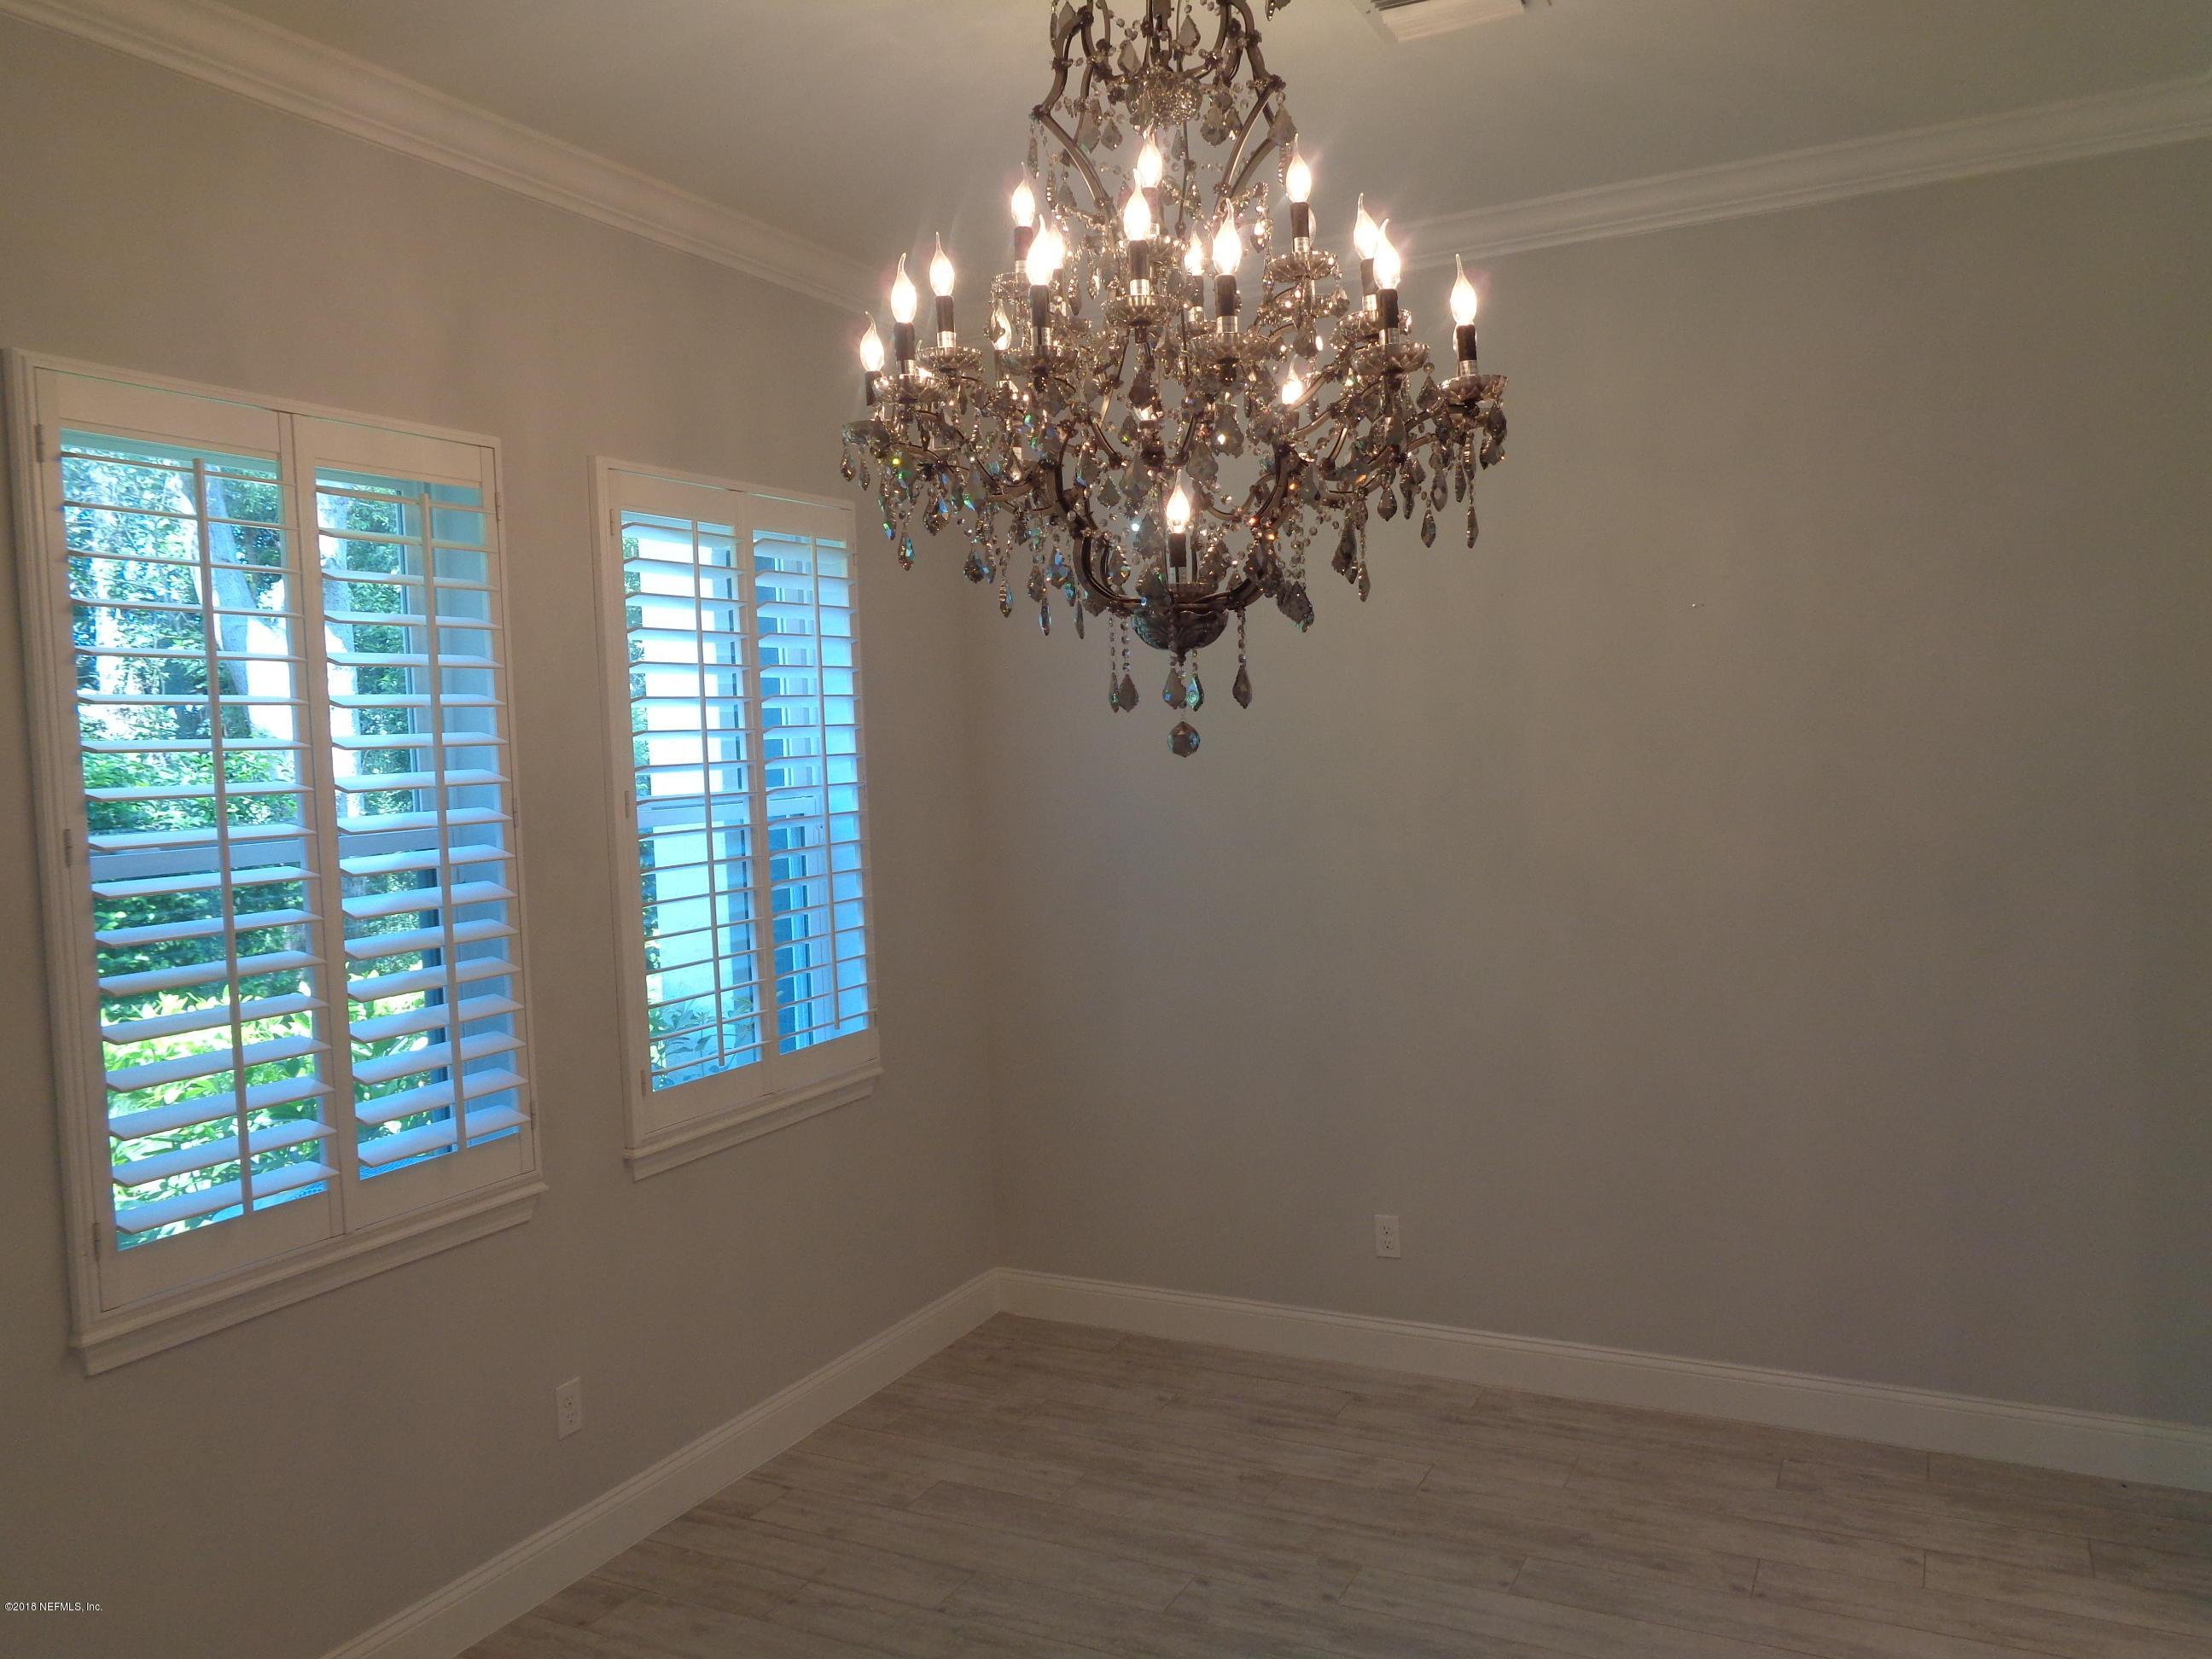 13307 SANTORINI, JACKSONVILLE, FLORIDA 32225, 3 Bedrooms Bedrooms, ,2 BathroomsBathrooms,Residential - townhome,For sale,SANTORINI,912654